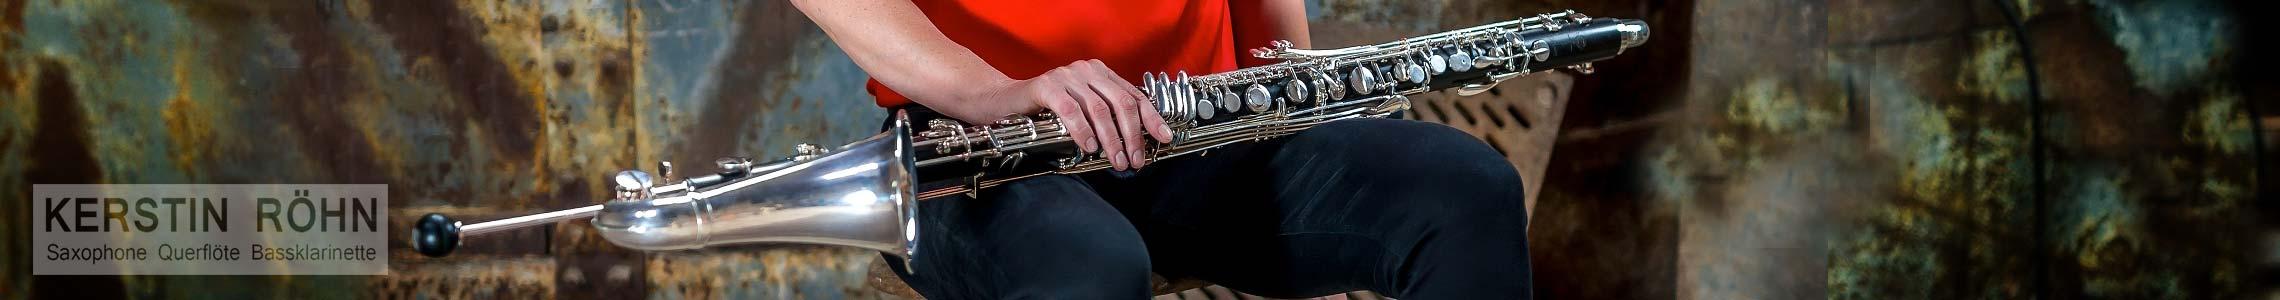 Kerstin Röhn - Saxophone, Klarinette, Flöte